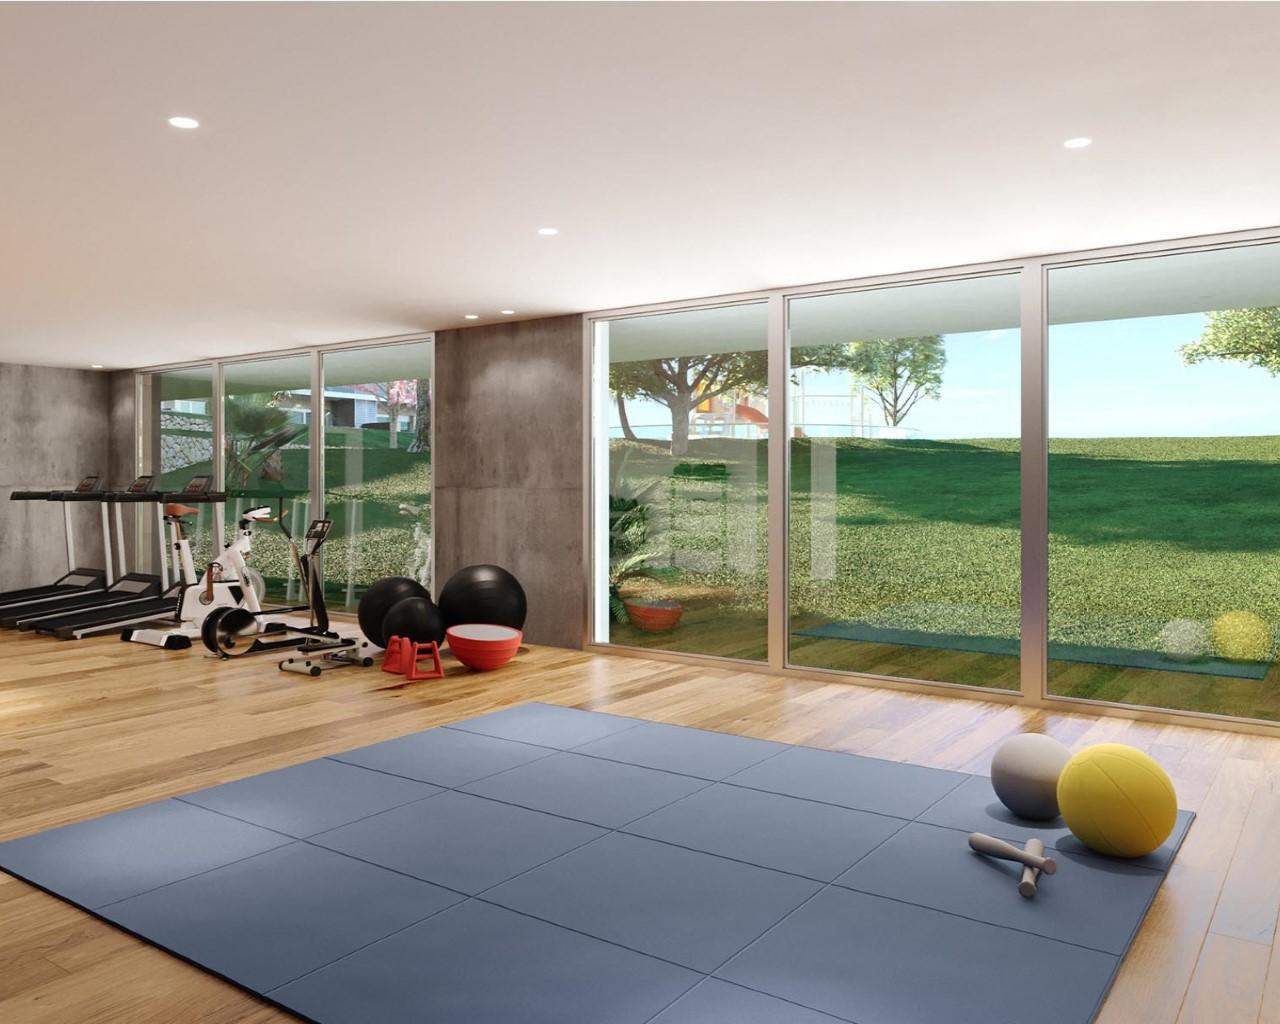 Tagus Bay - Gym